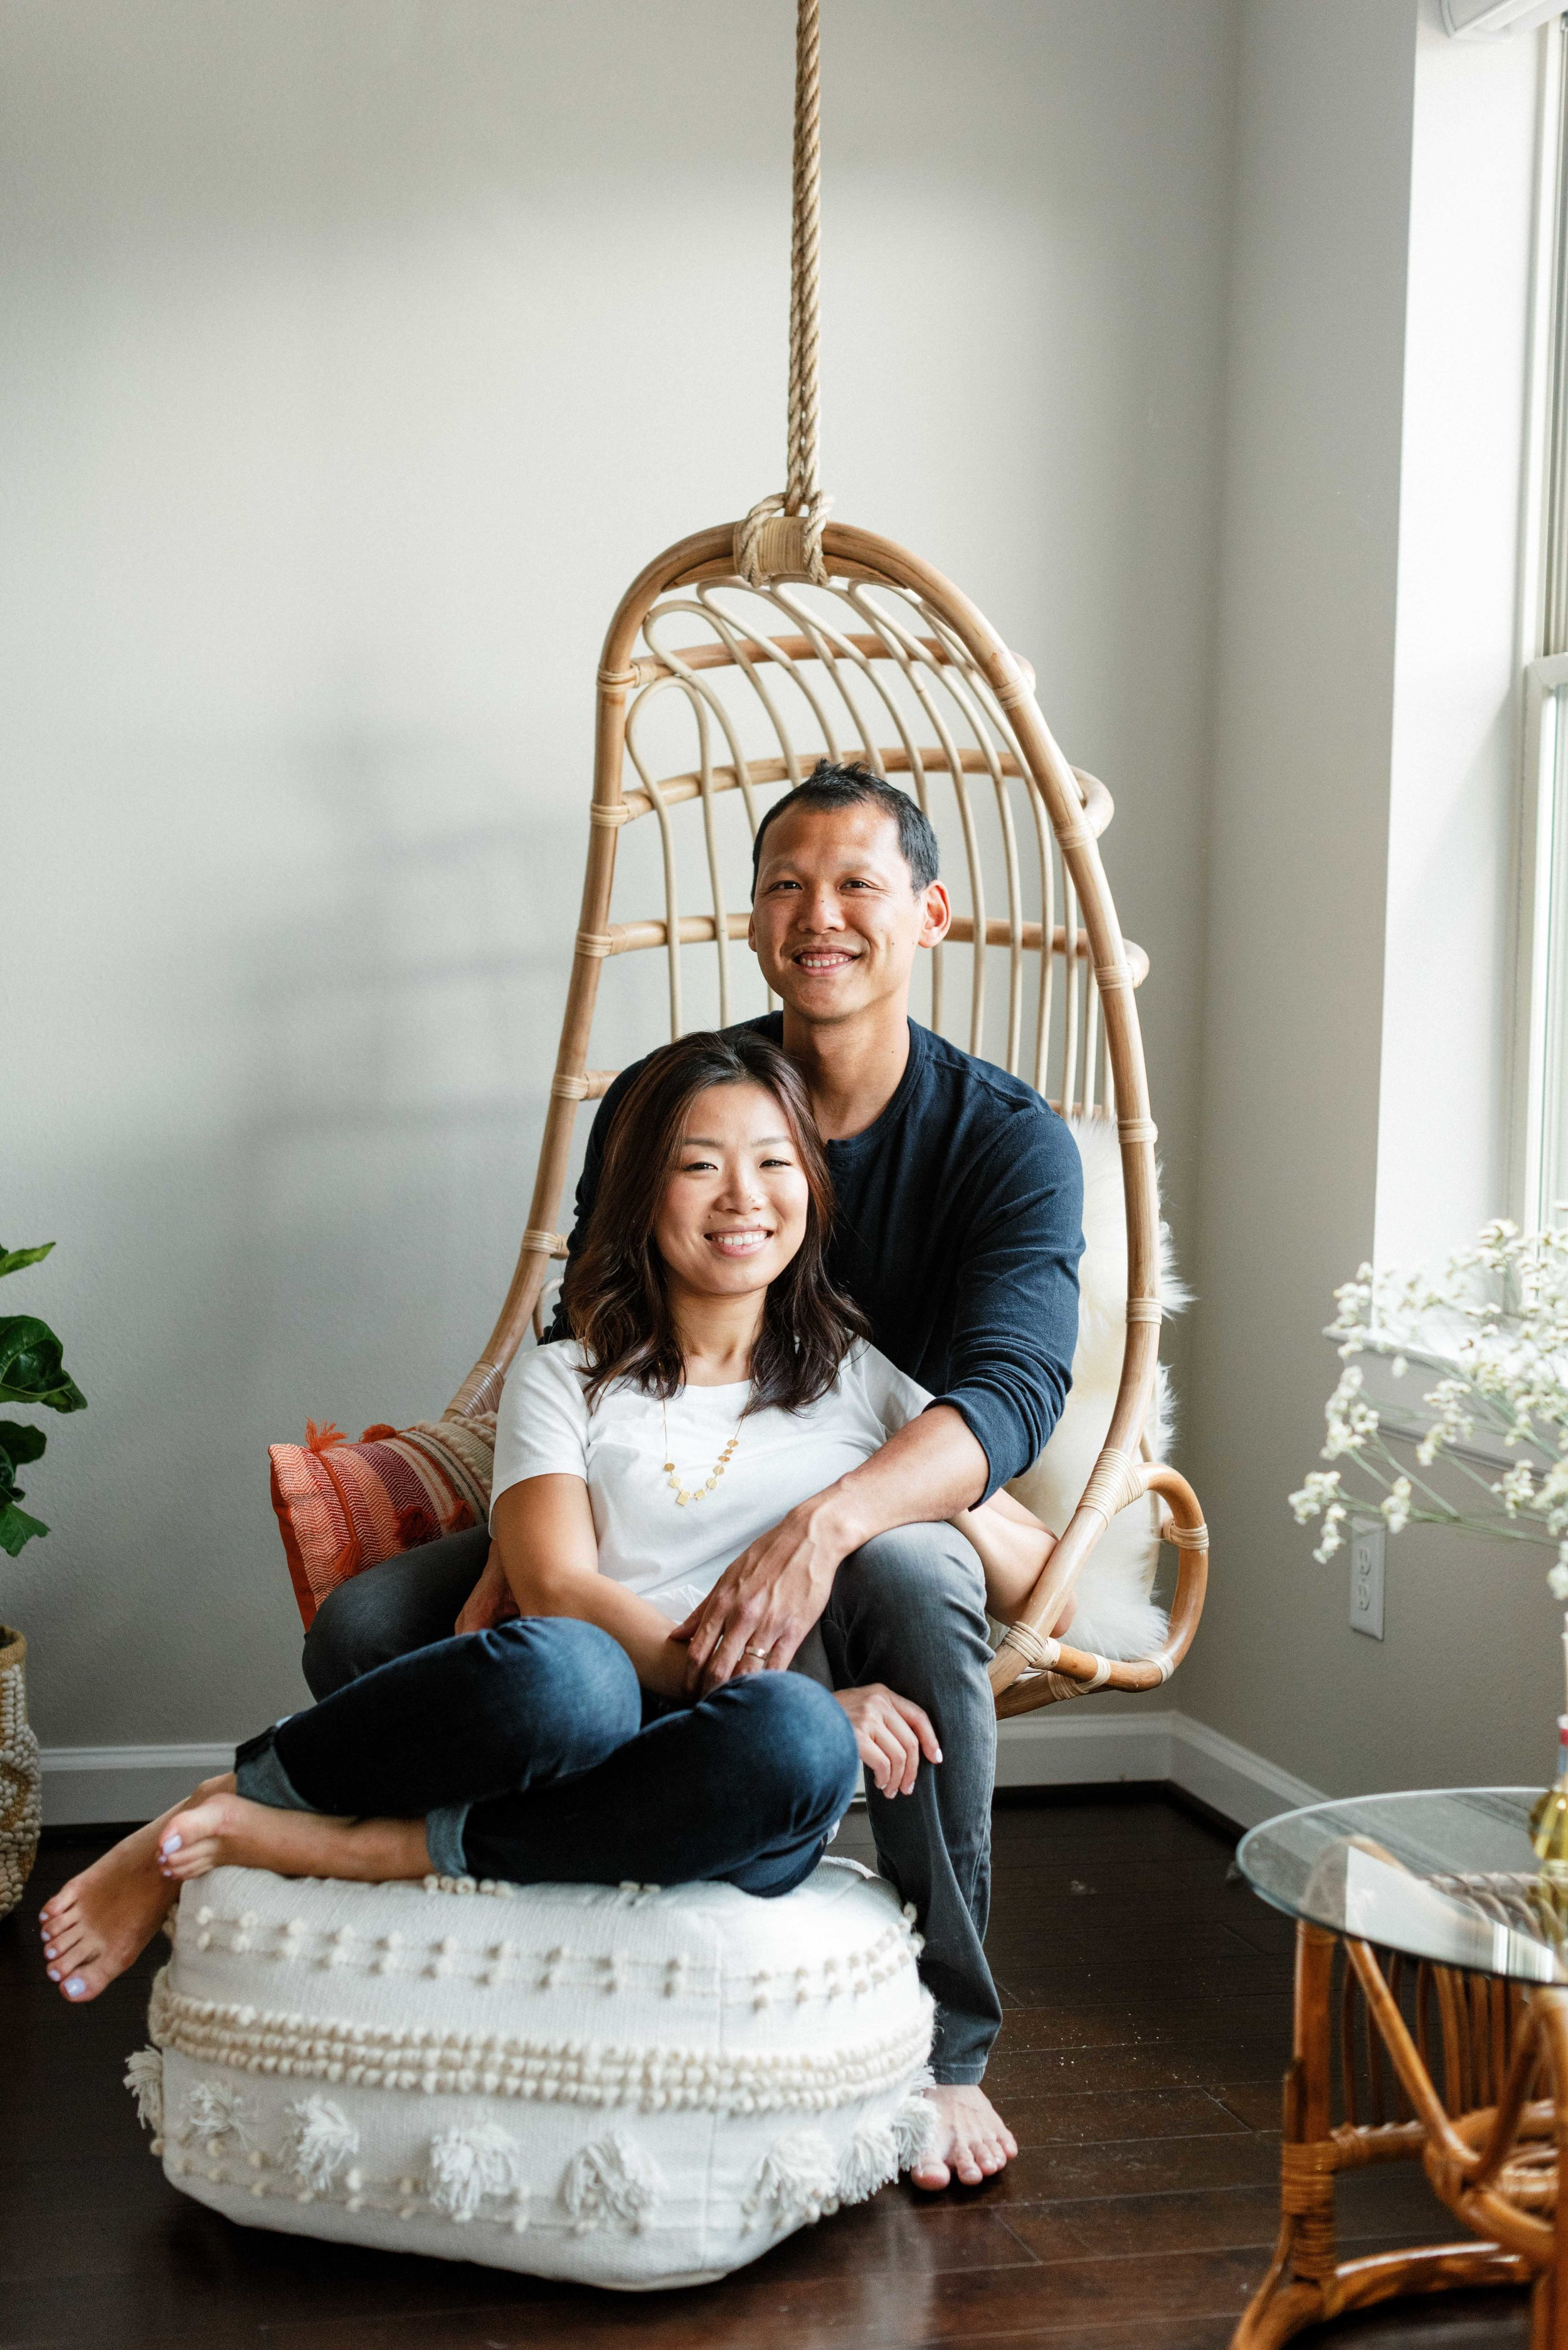 Houston-Wedding-Photographer-Best-Top-Luxury-Destination-Engagements-Portrait-Austin-Photography-12.jpg